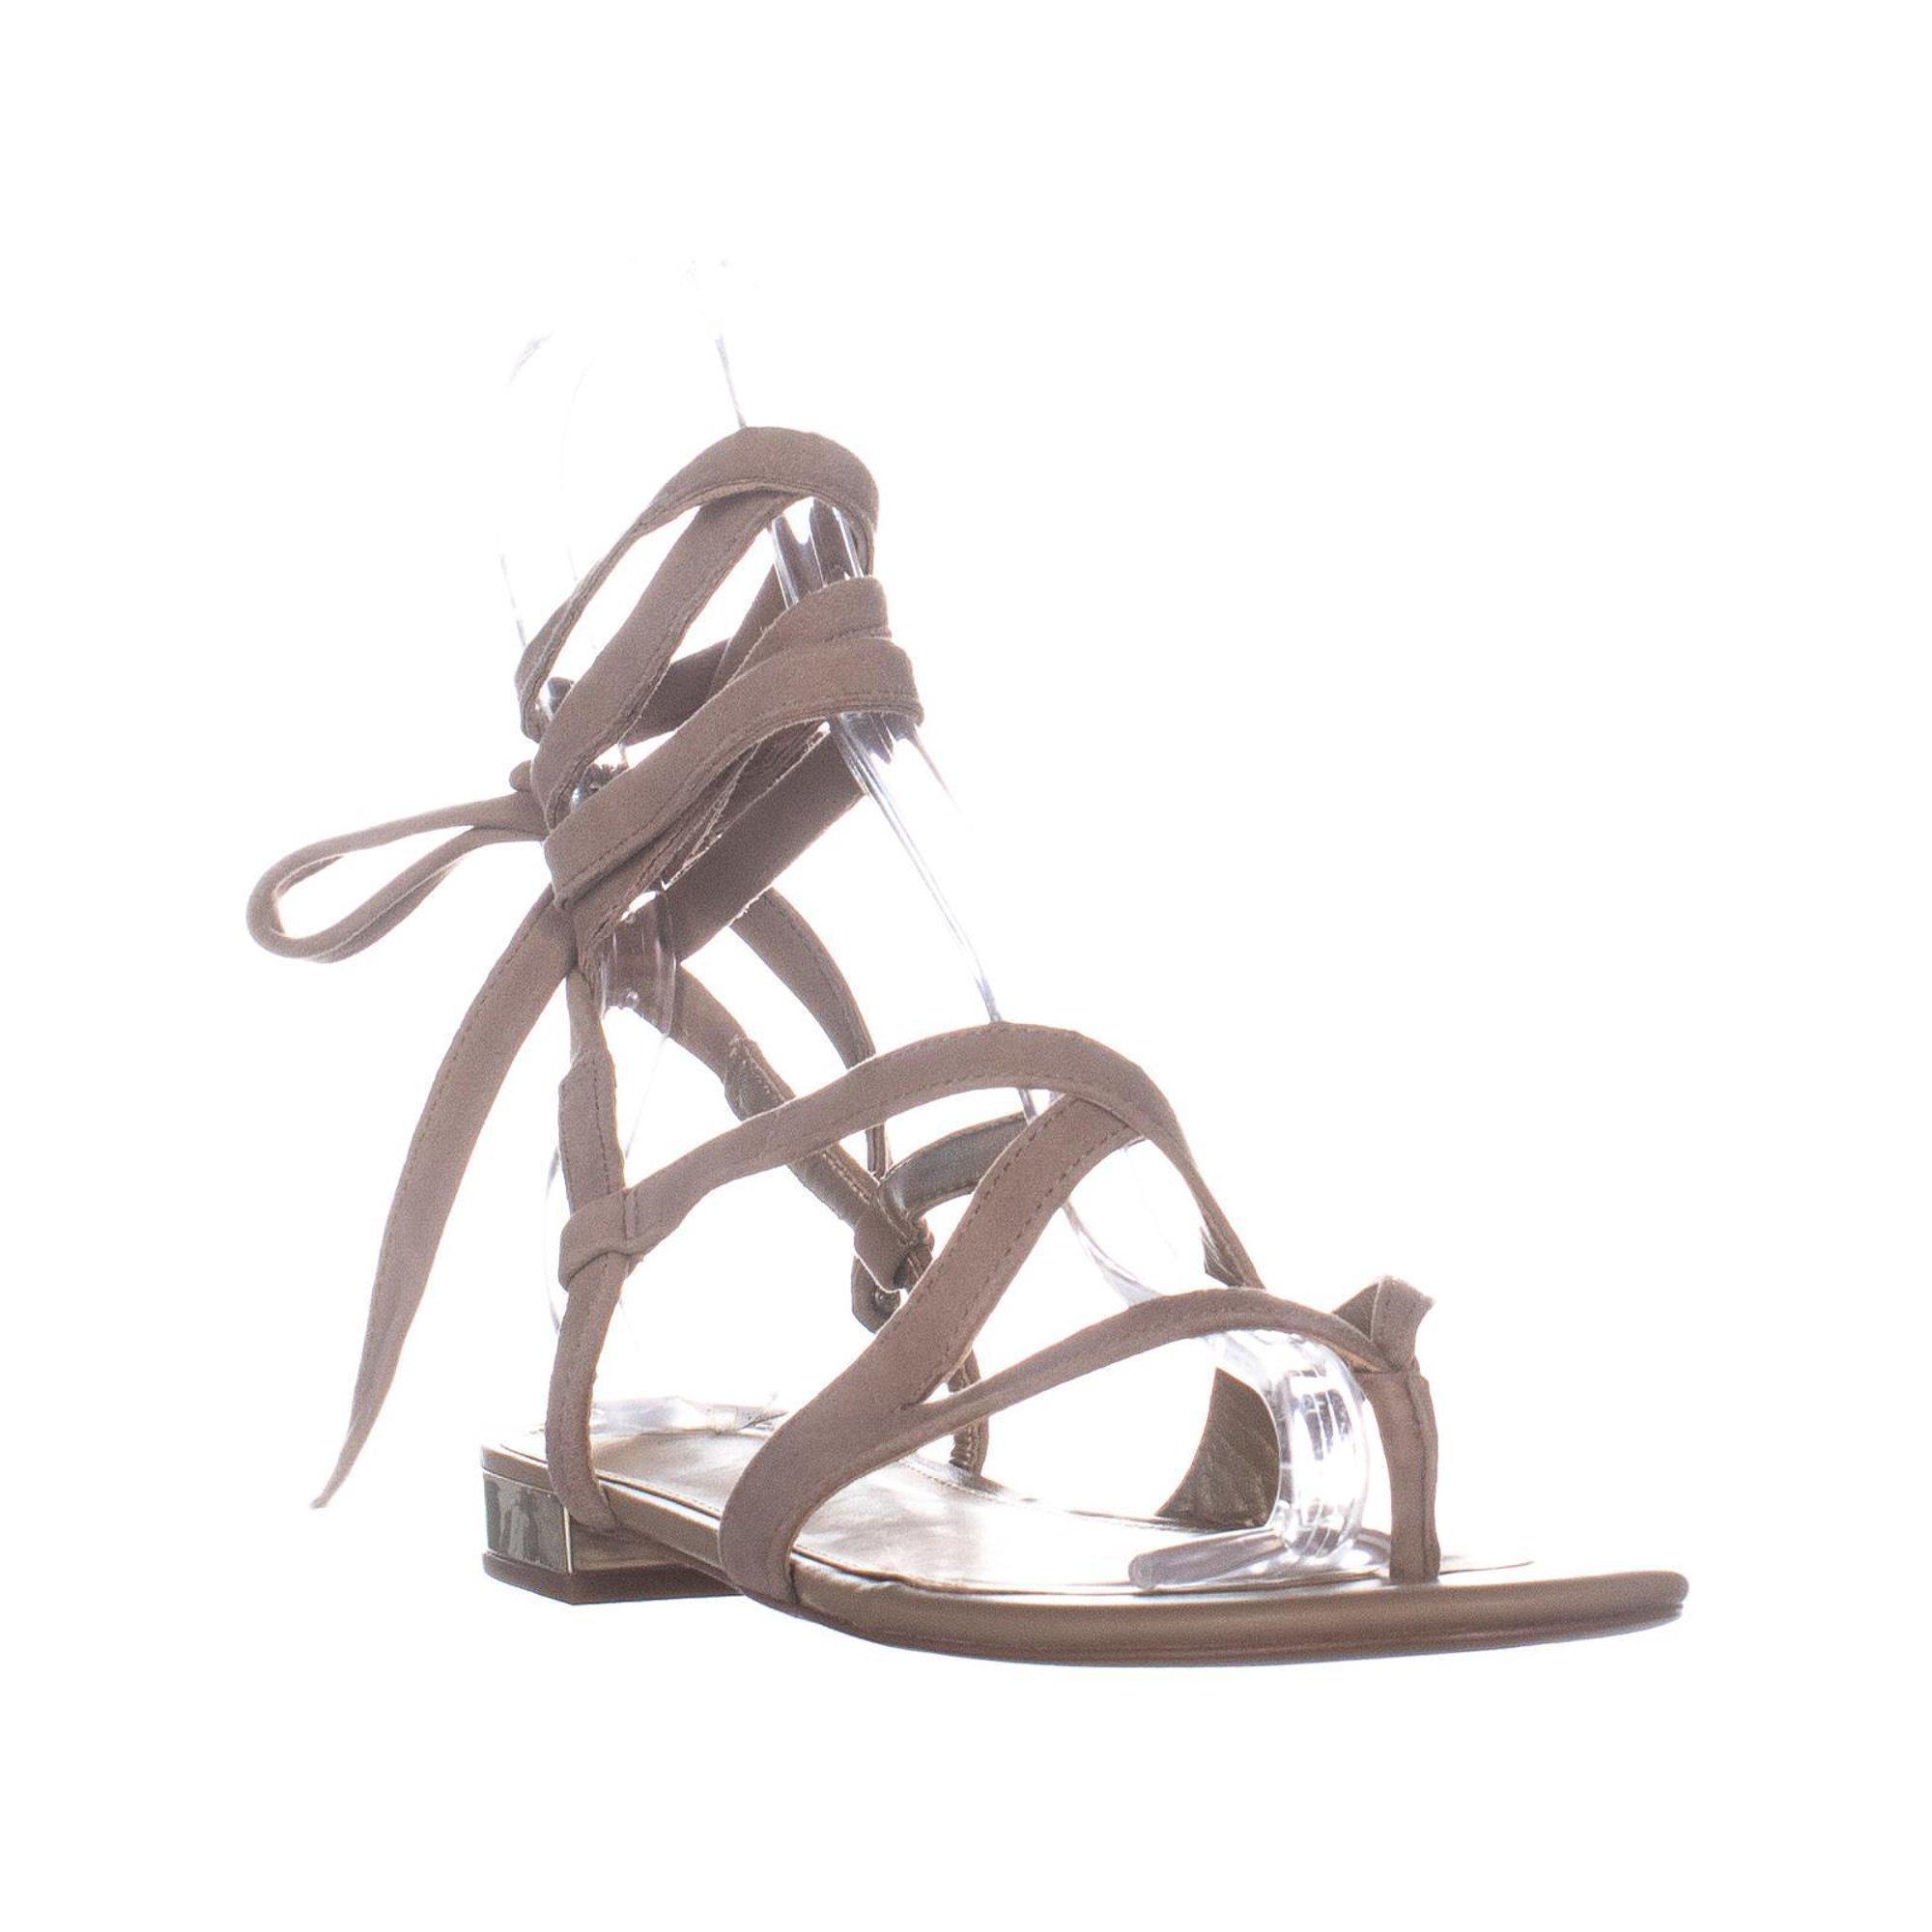 f0975a634 Sam Edelman Davina Lace Up Flat Sandals